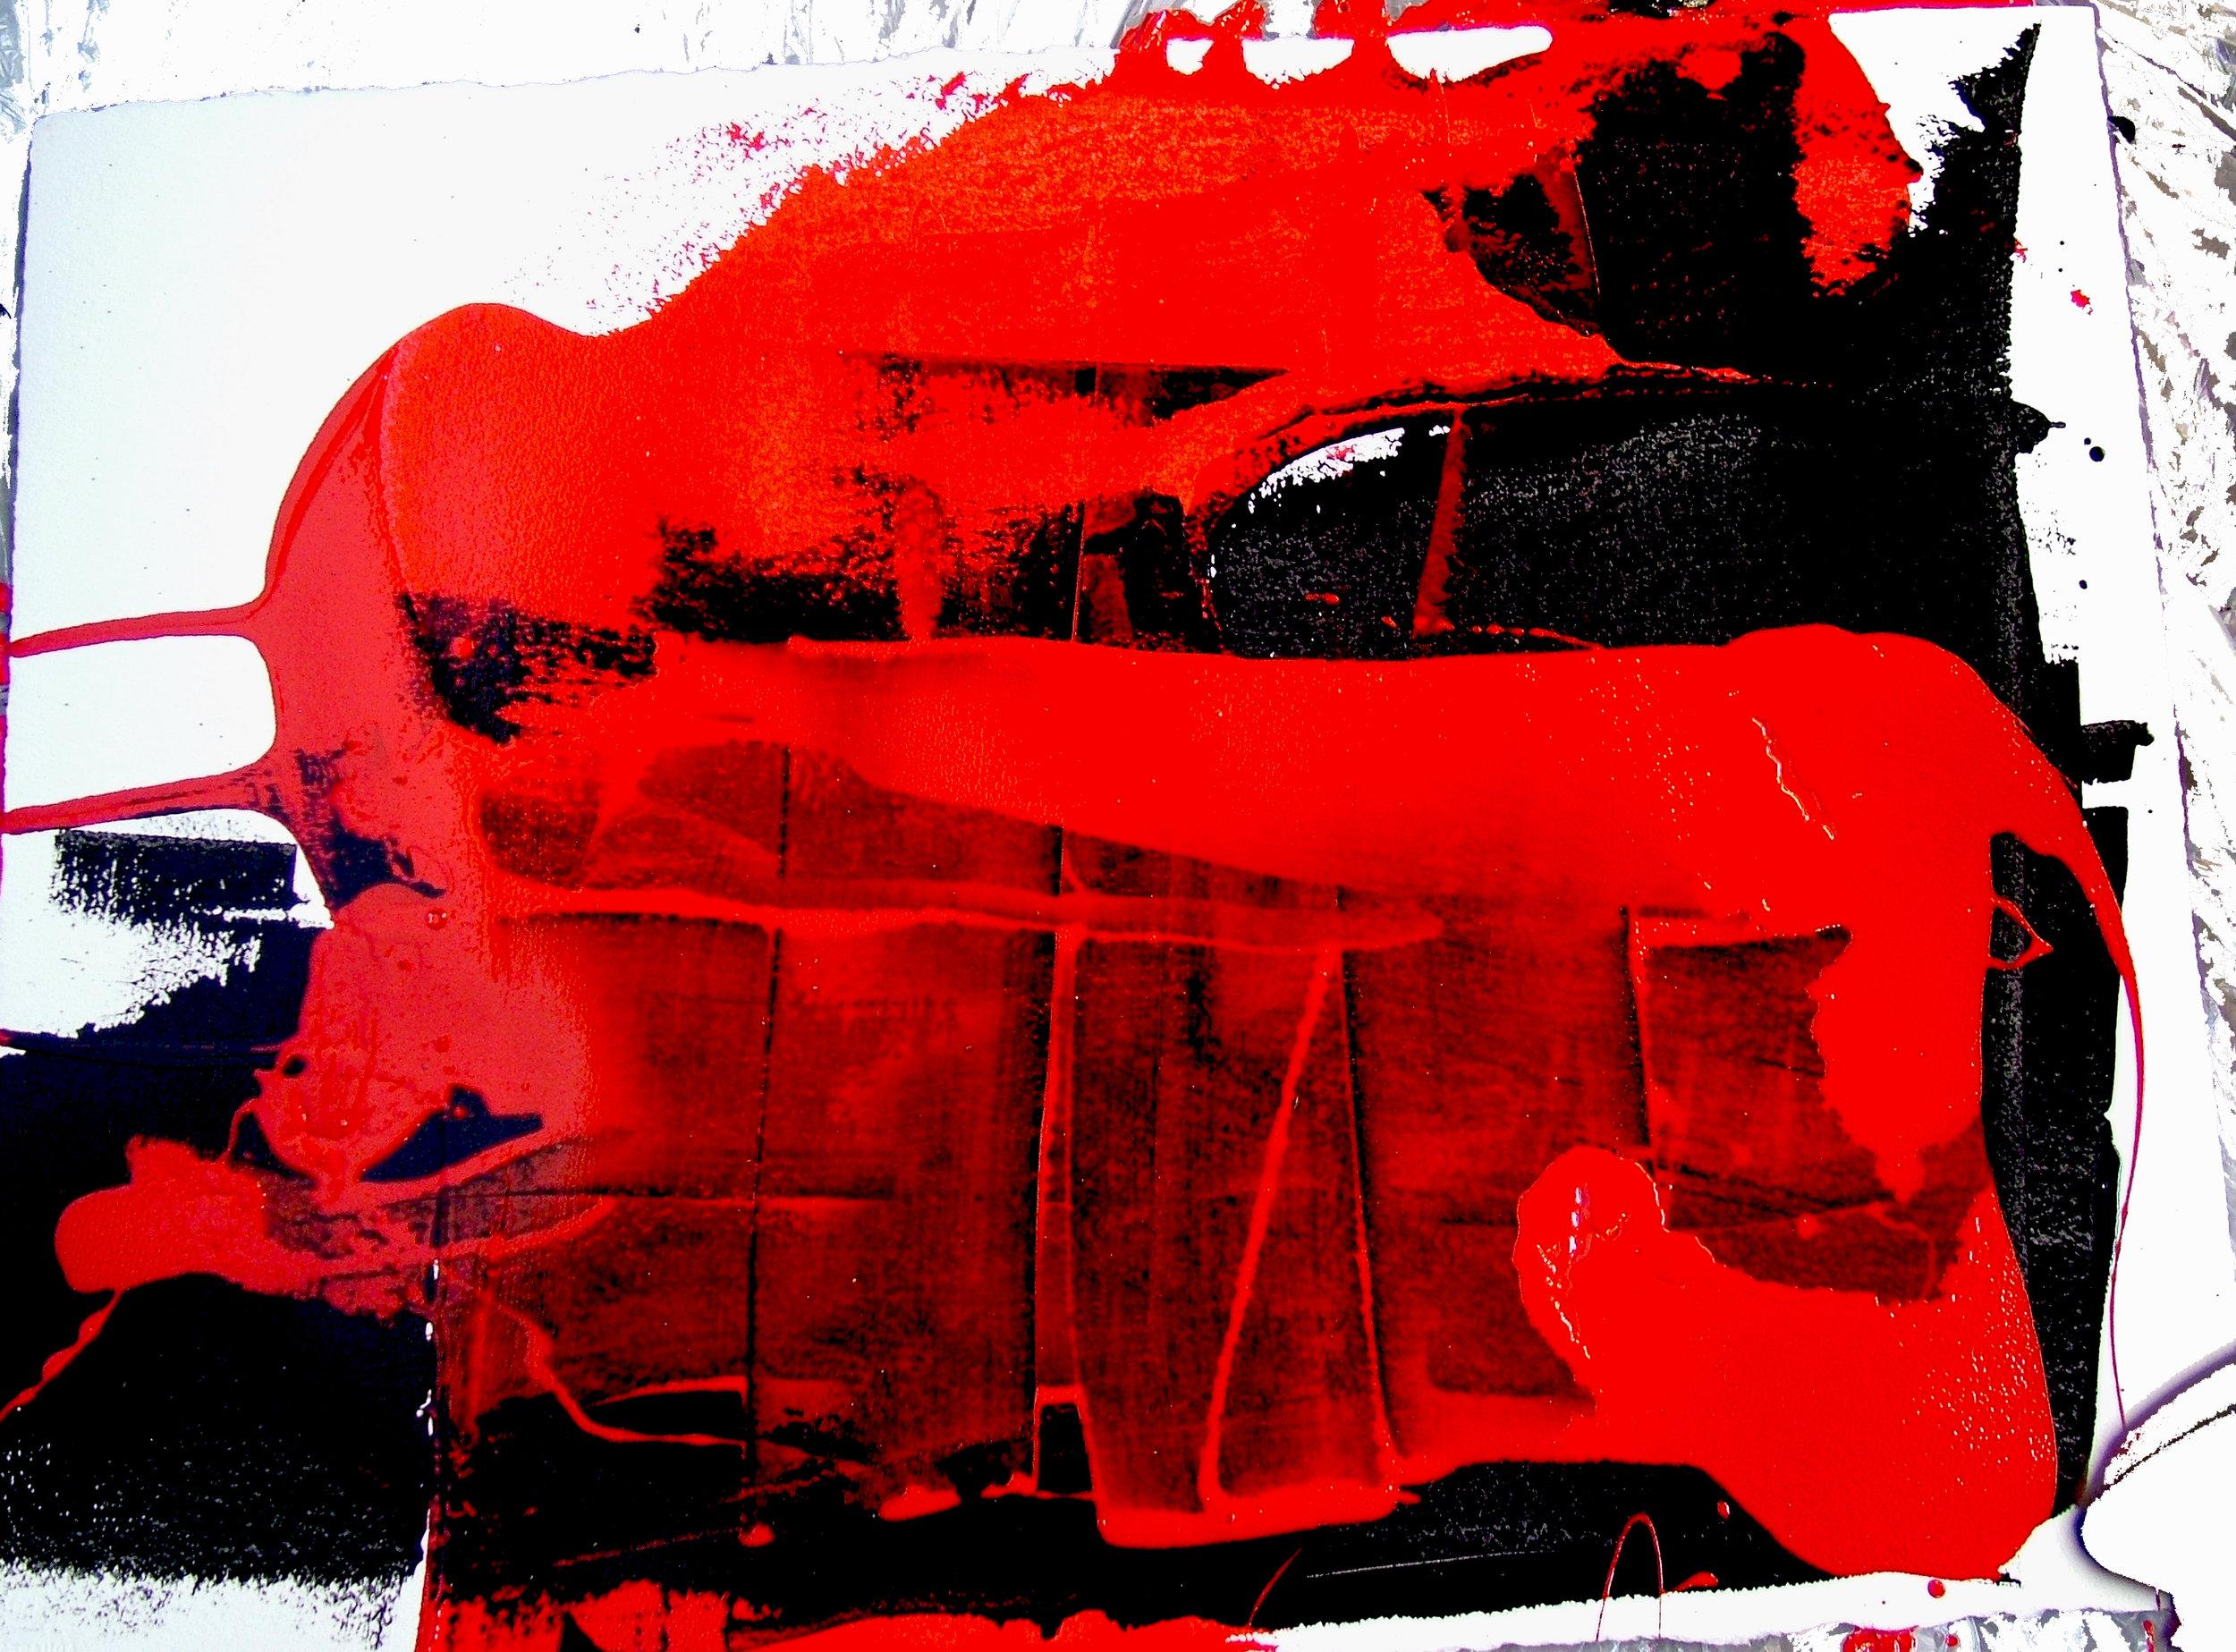 Risque Red 2 copy.jpg